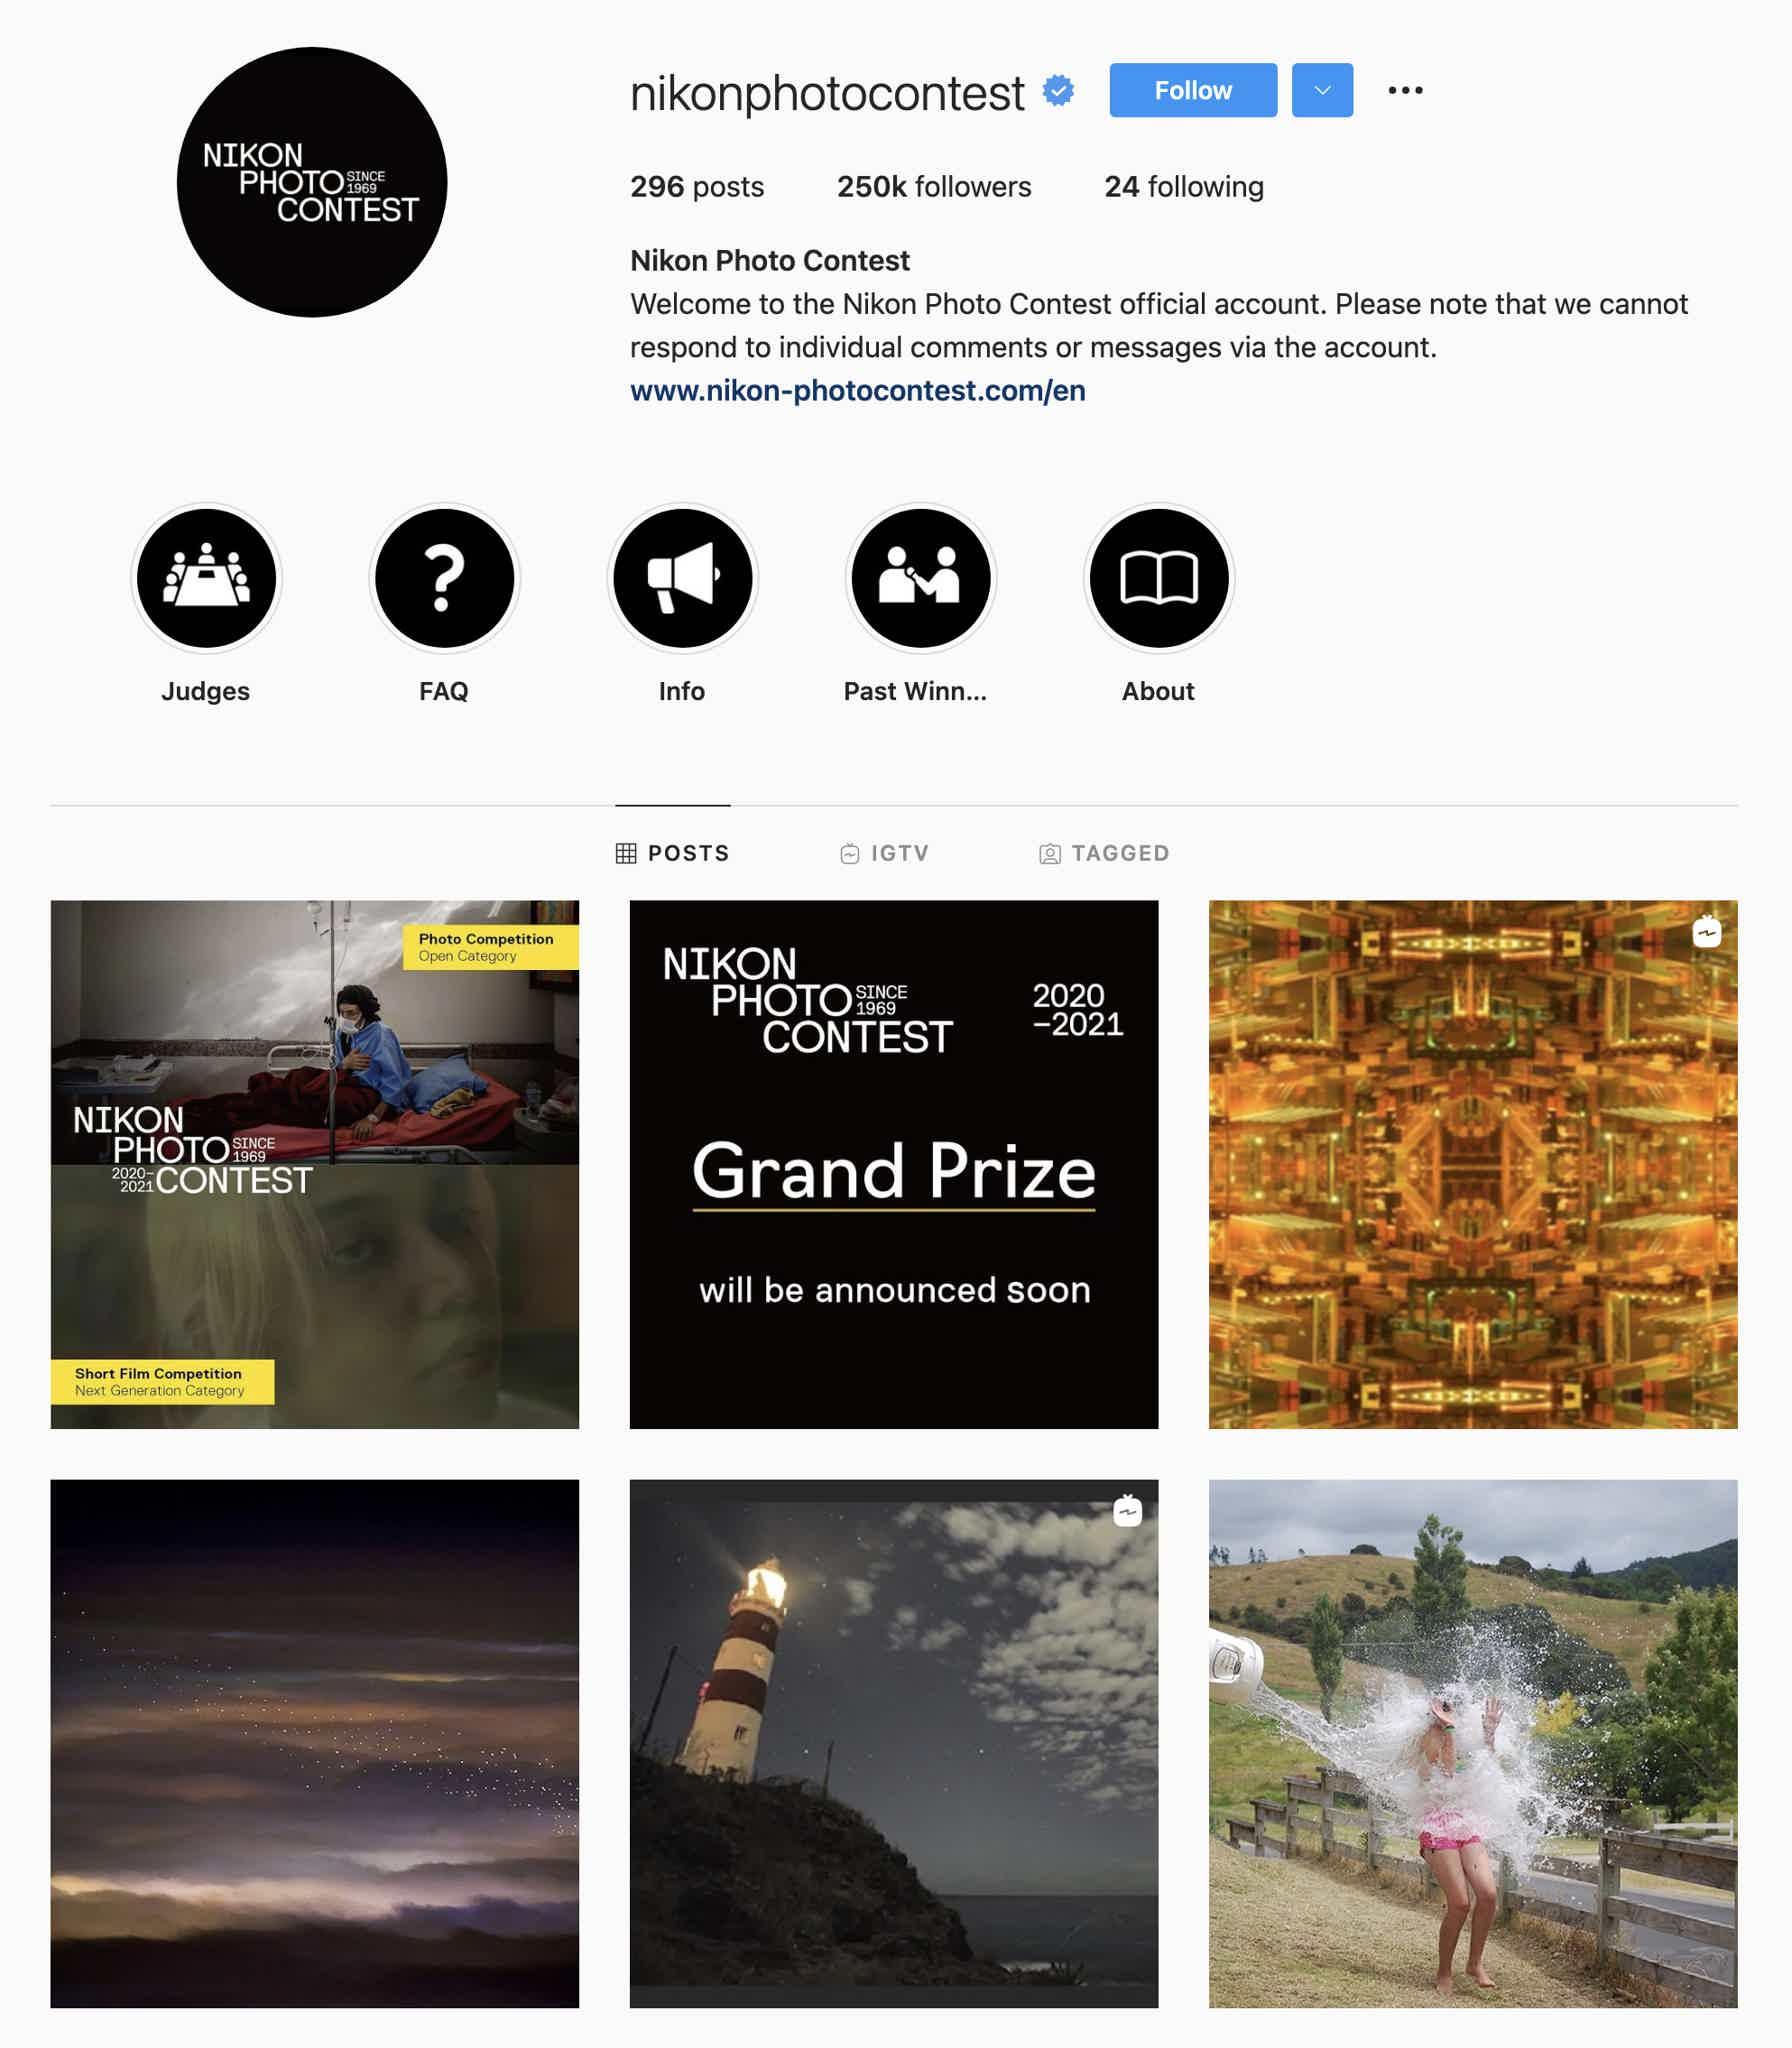 Nikon Photo Contest Instagram